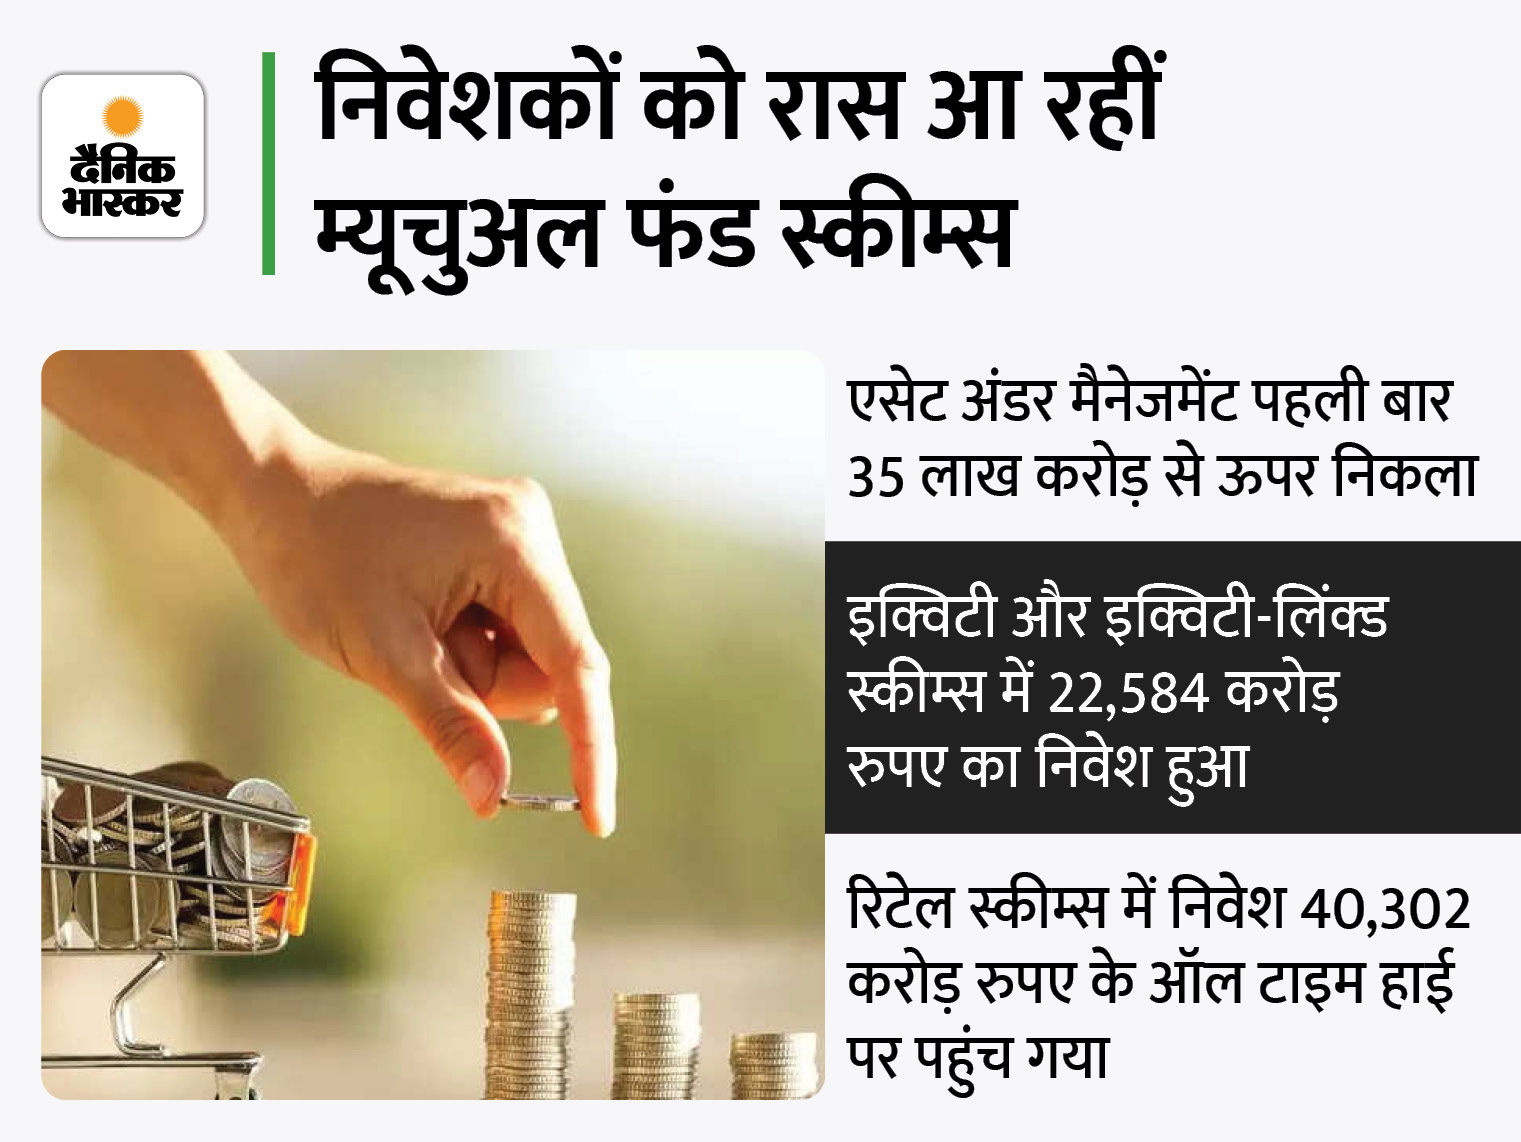 इक्विटी फंड में निवेश साढ़े तीन गुना बढ़कर 22,583 करोड़ रुपए पर पहुंचा, रिकॉर्ड 23 लाख से ज्यादा SIP खाते खुले|बिजनेस,Business - Dainik Bhaskar